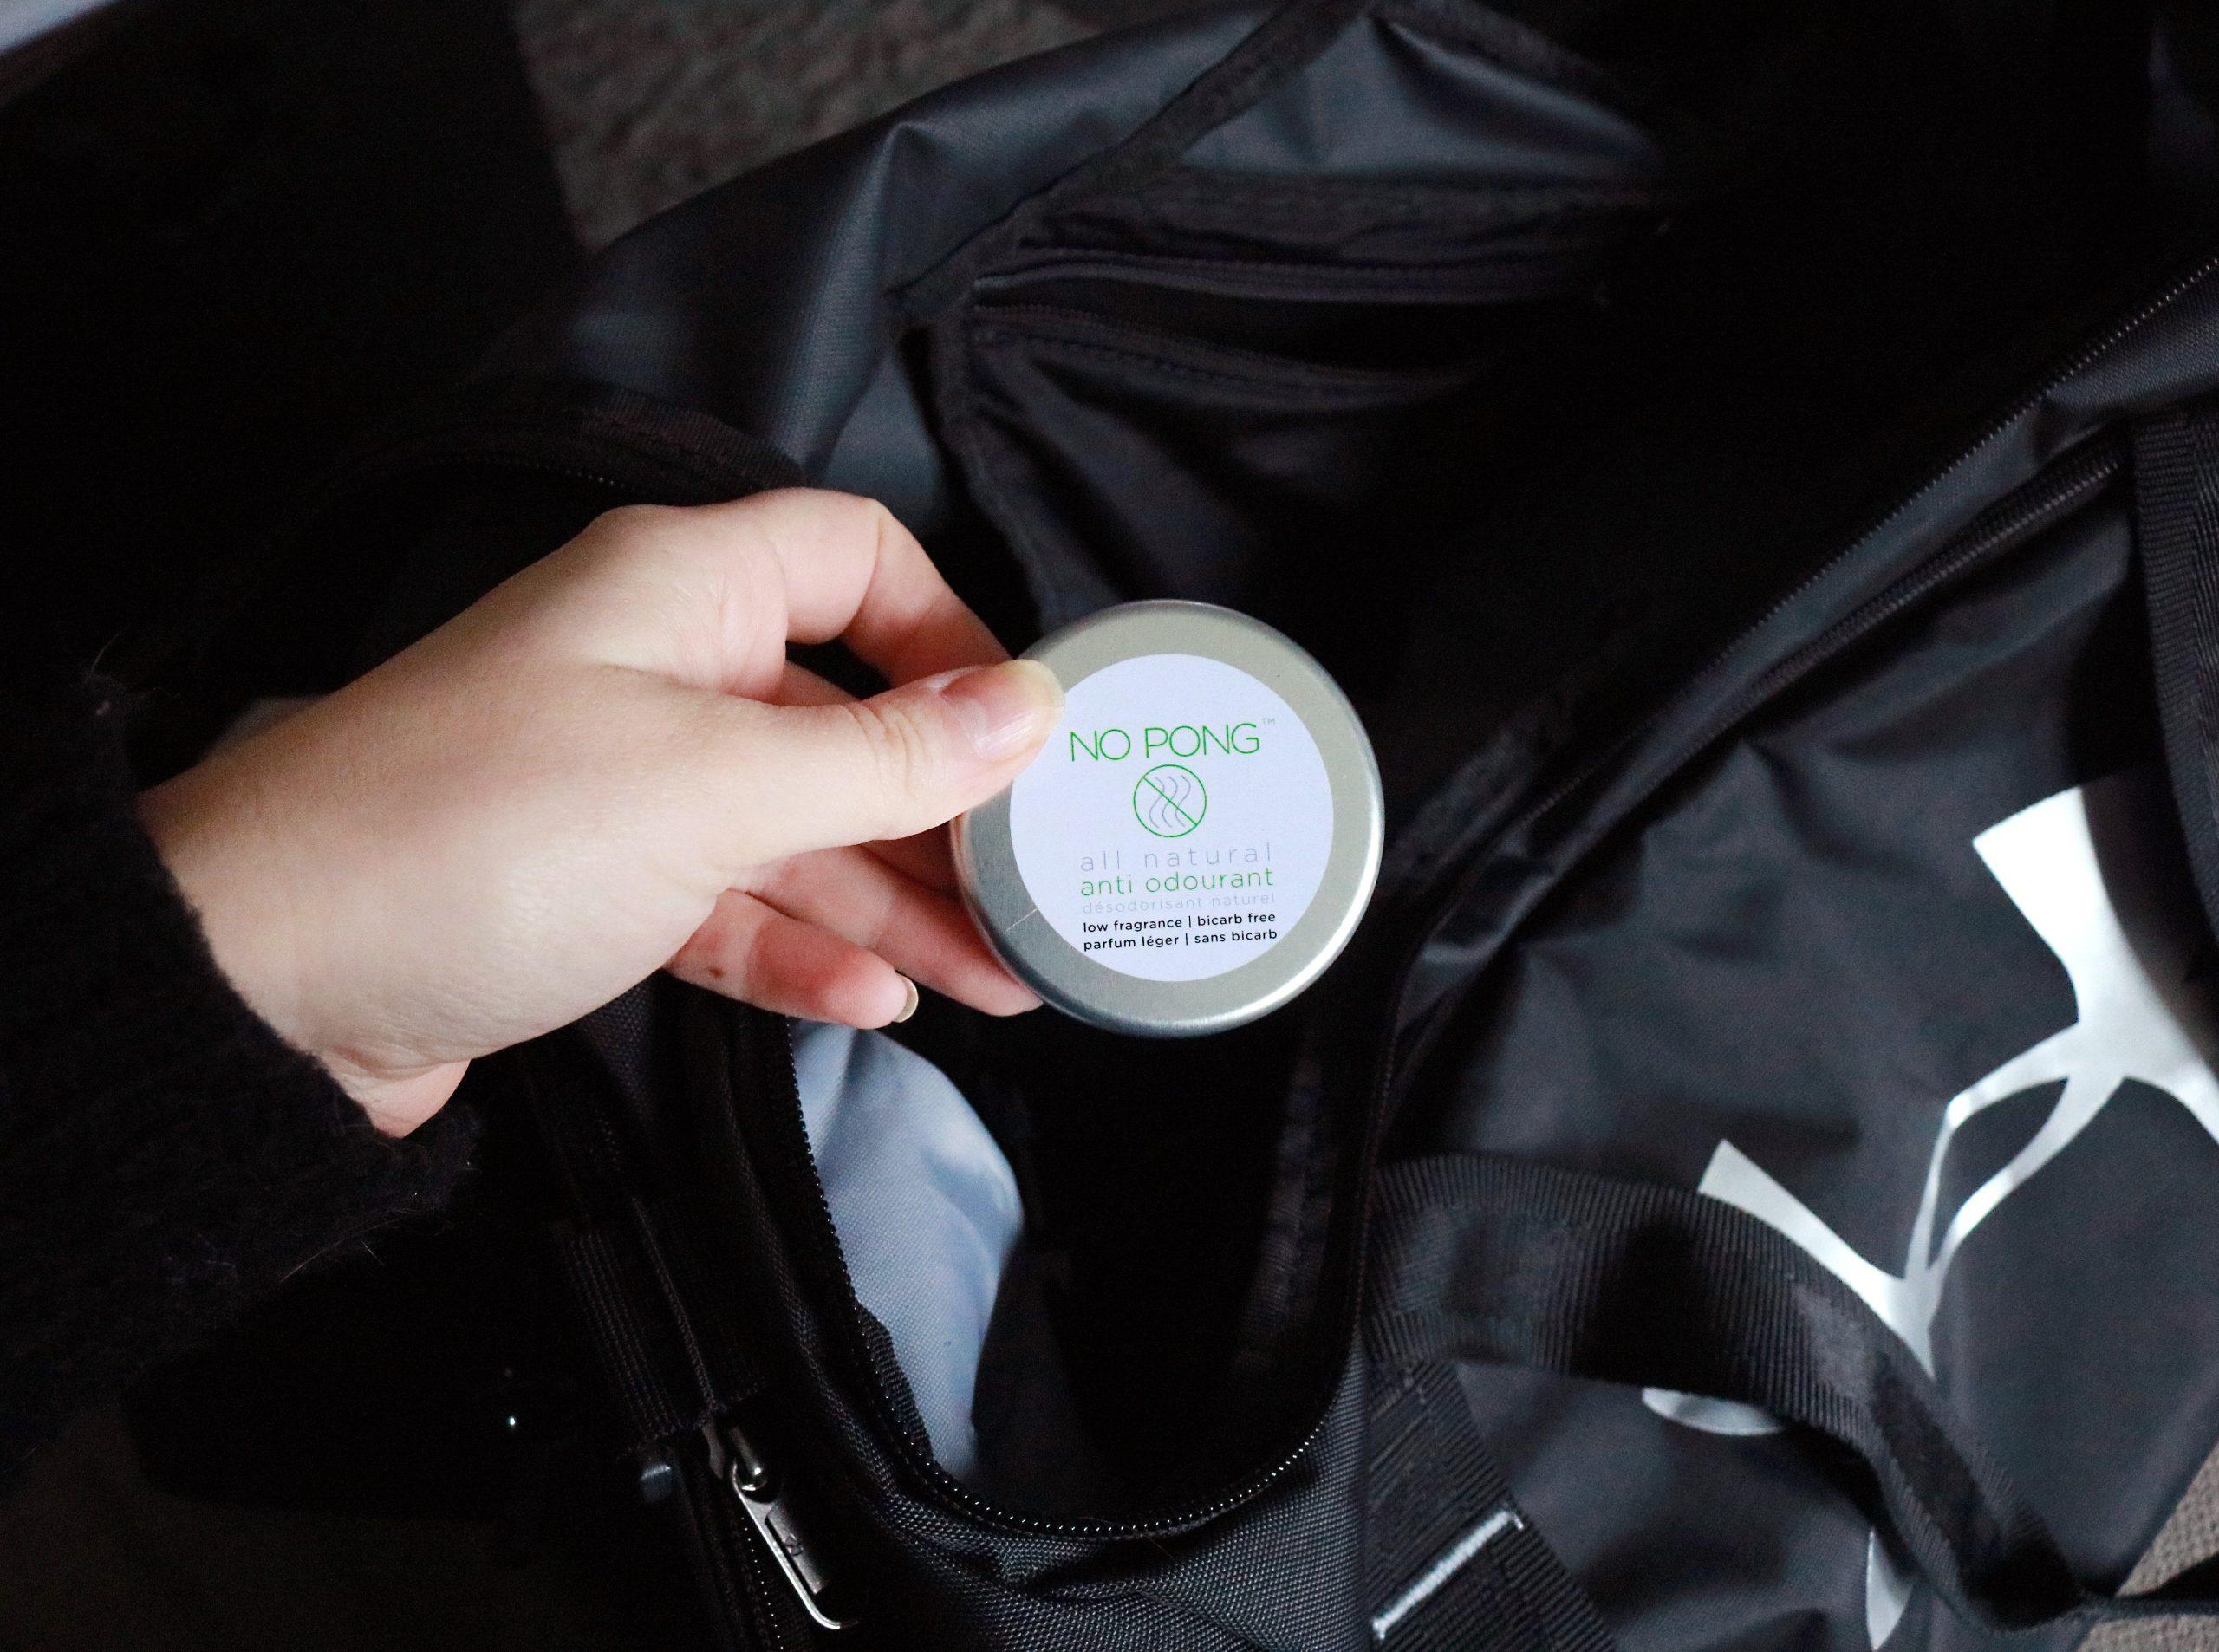 Natural Deodorant Review: No Pong